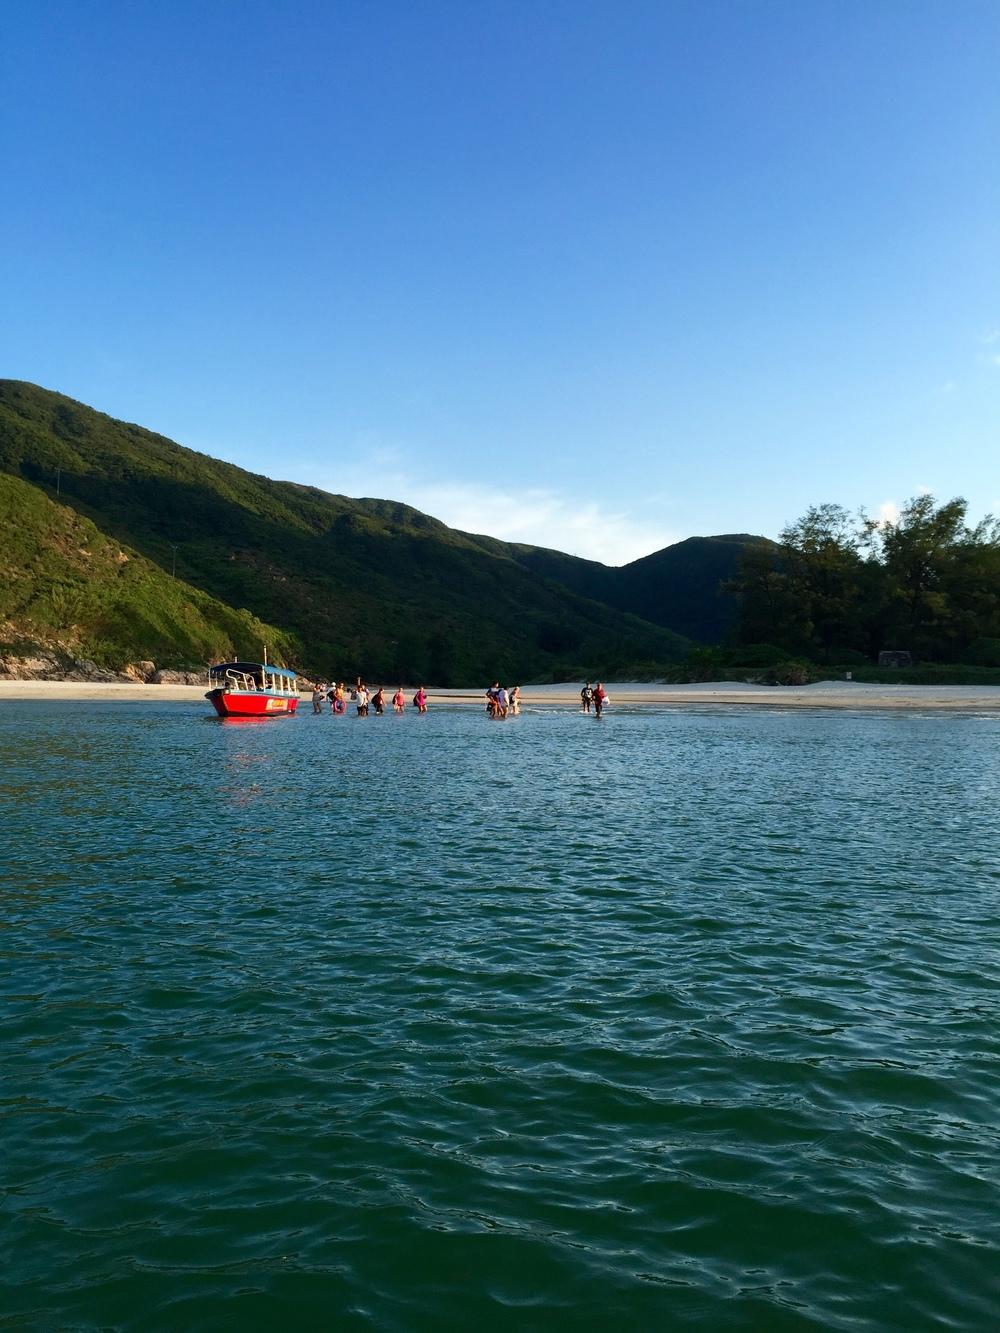 Beachgoers boarding the water taxi.